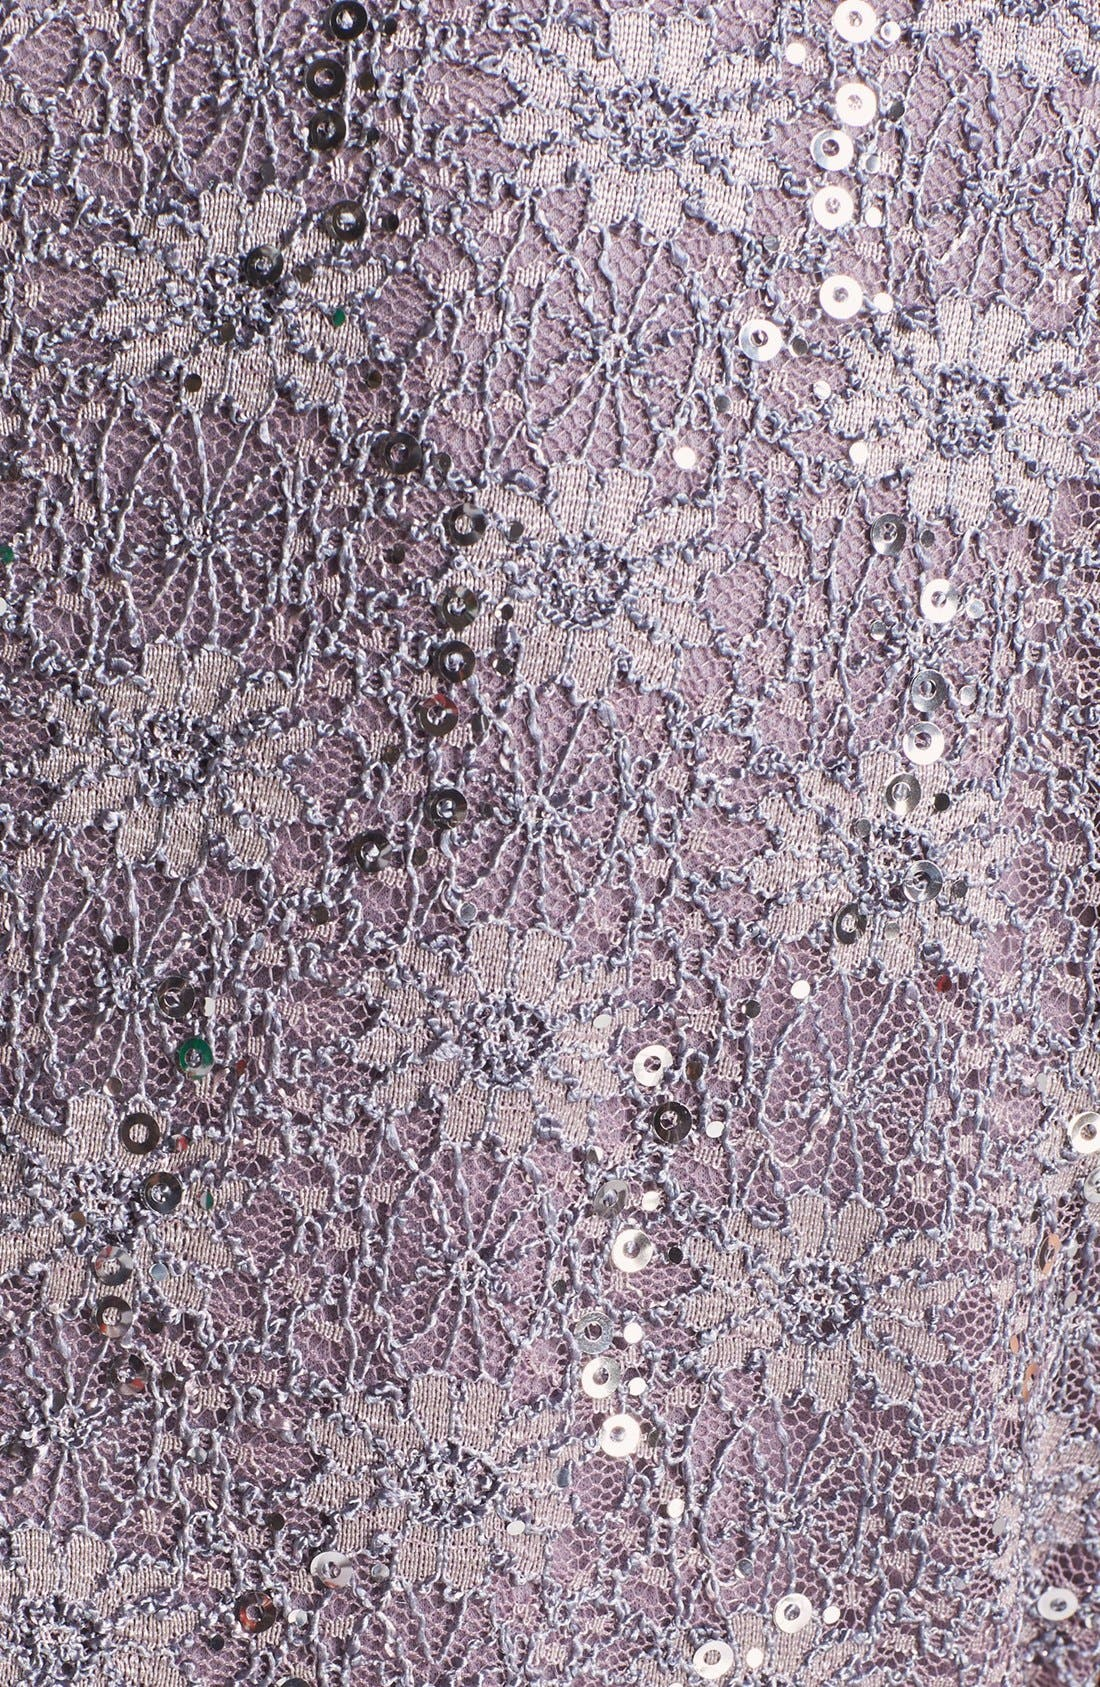 Sequin Lace Overlay Sheath Dress,                             Alternate thumbnail 4, color,                             031